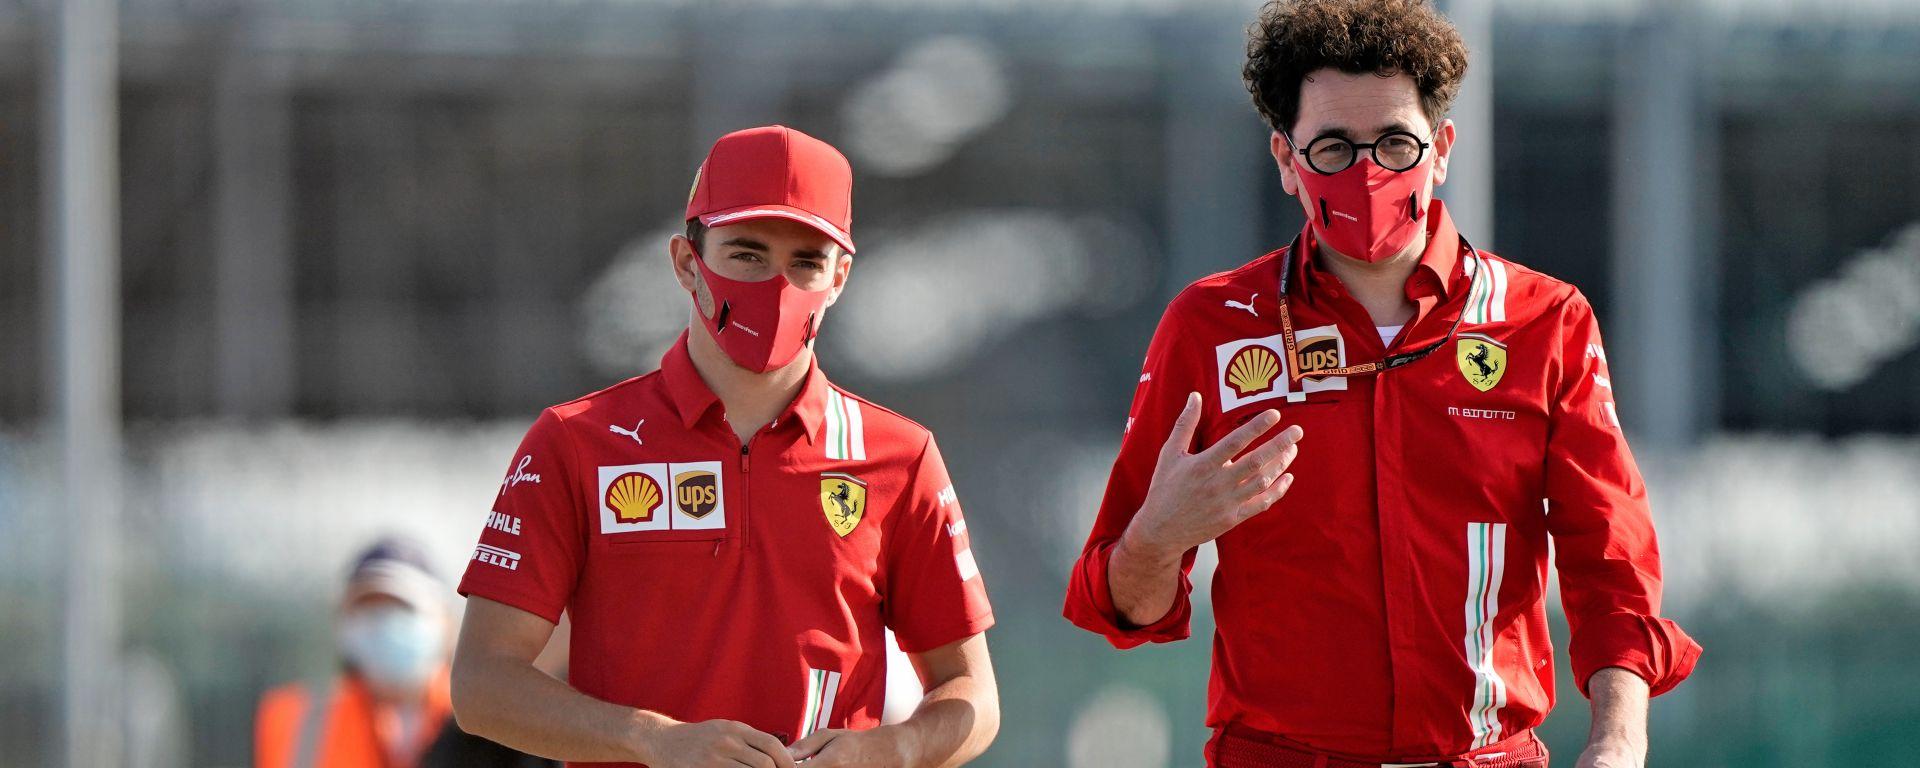 F1 2020: Charles Leclerc e Mattia Binotto (Ferrari)